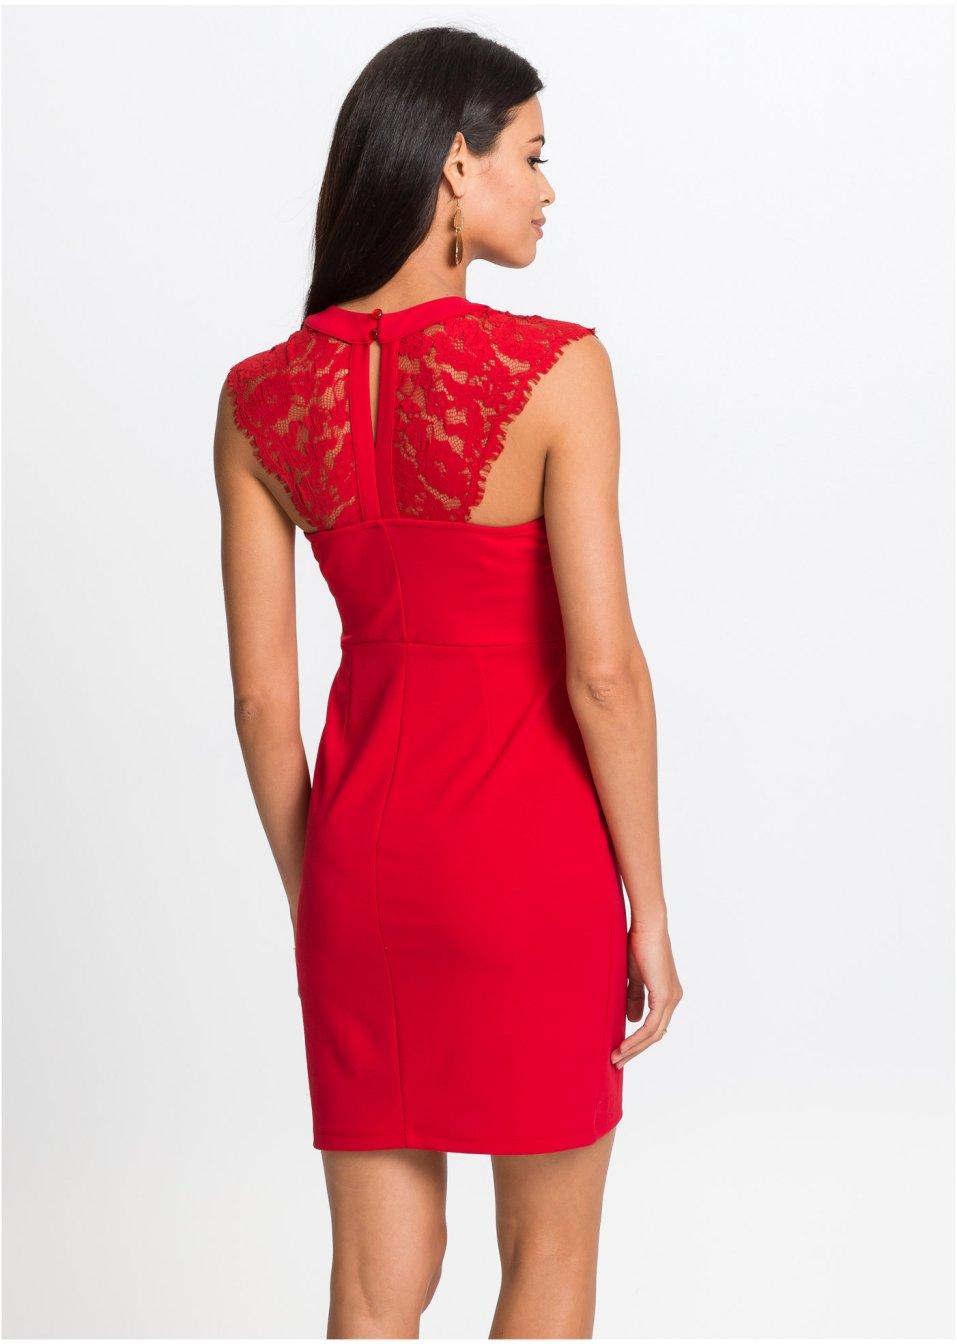 Kleid mit Spitze rot - Damen - BODYFLIRT - bonprix.de